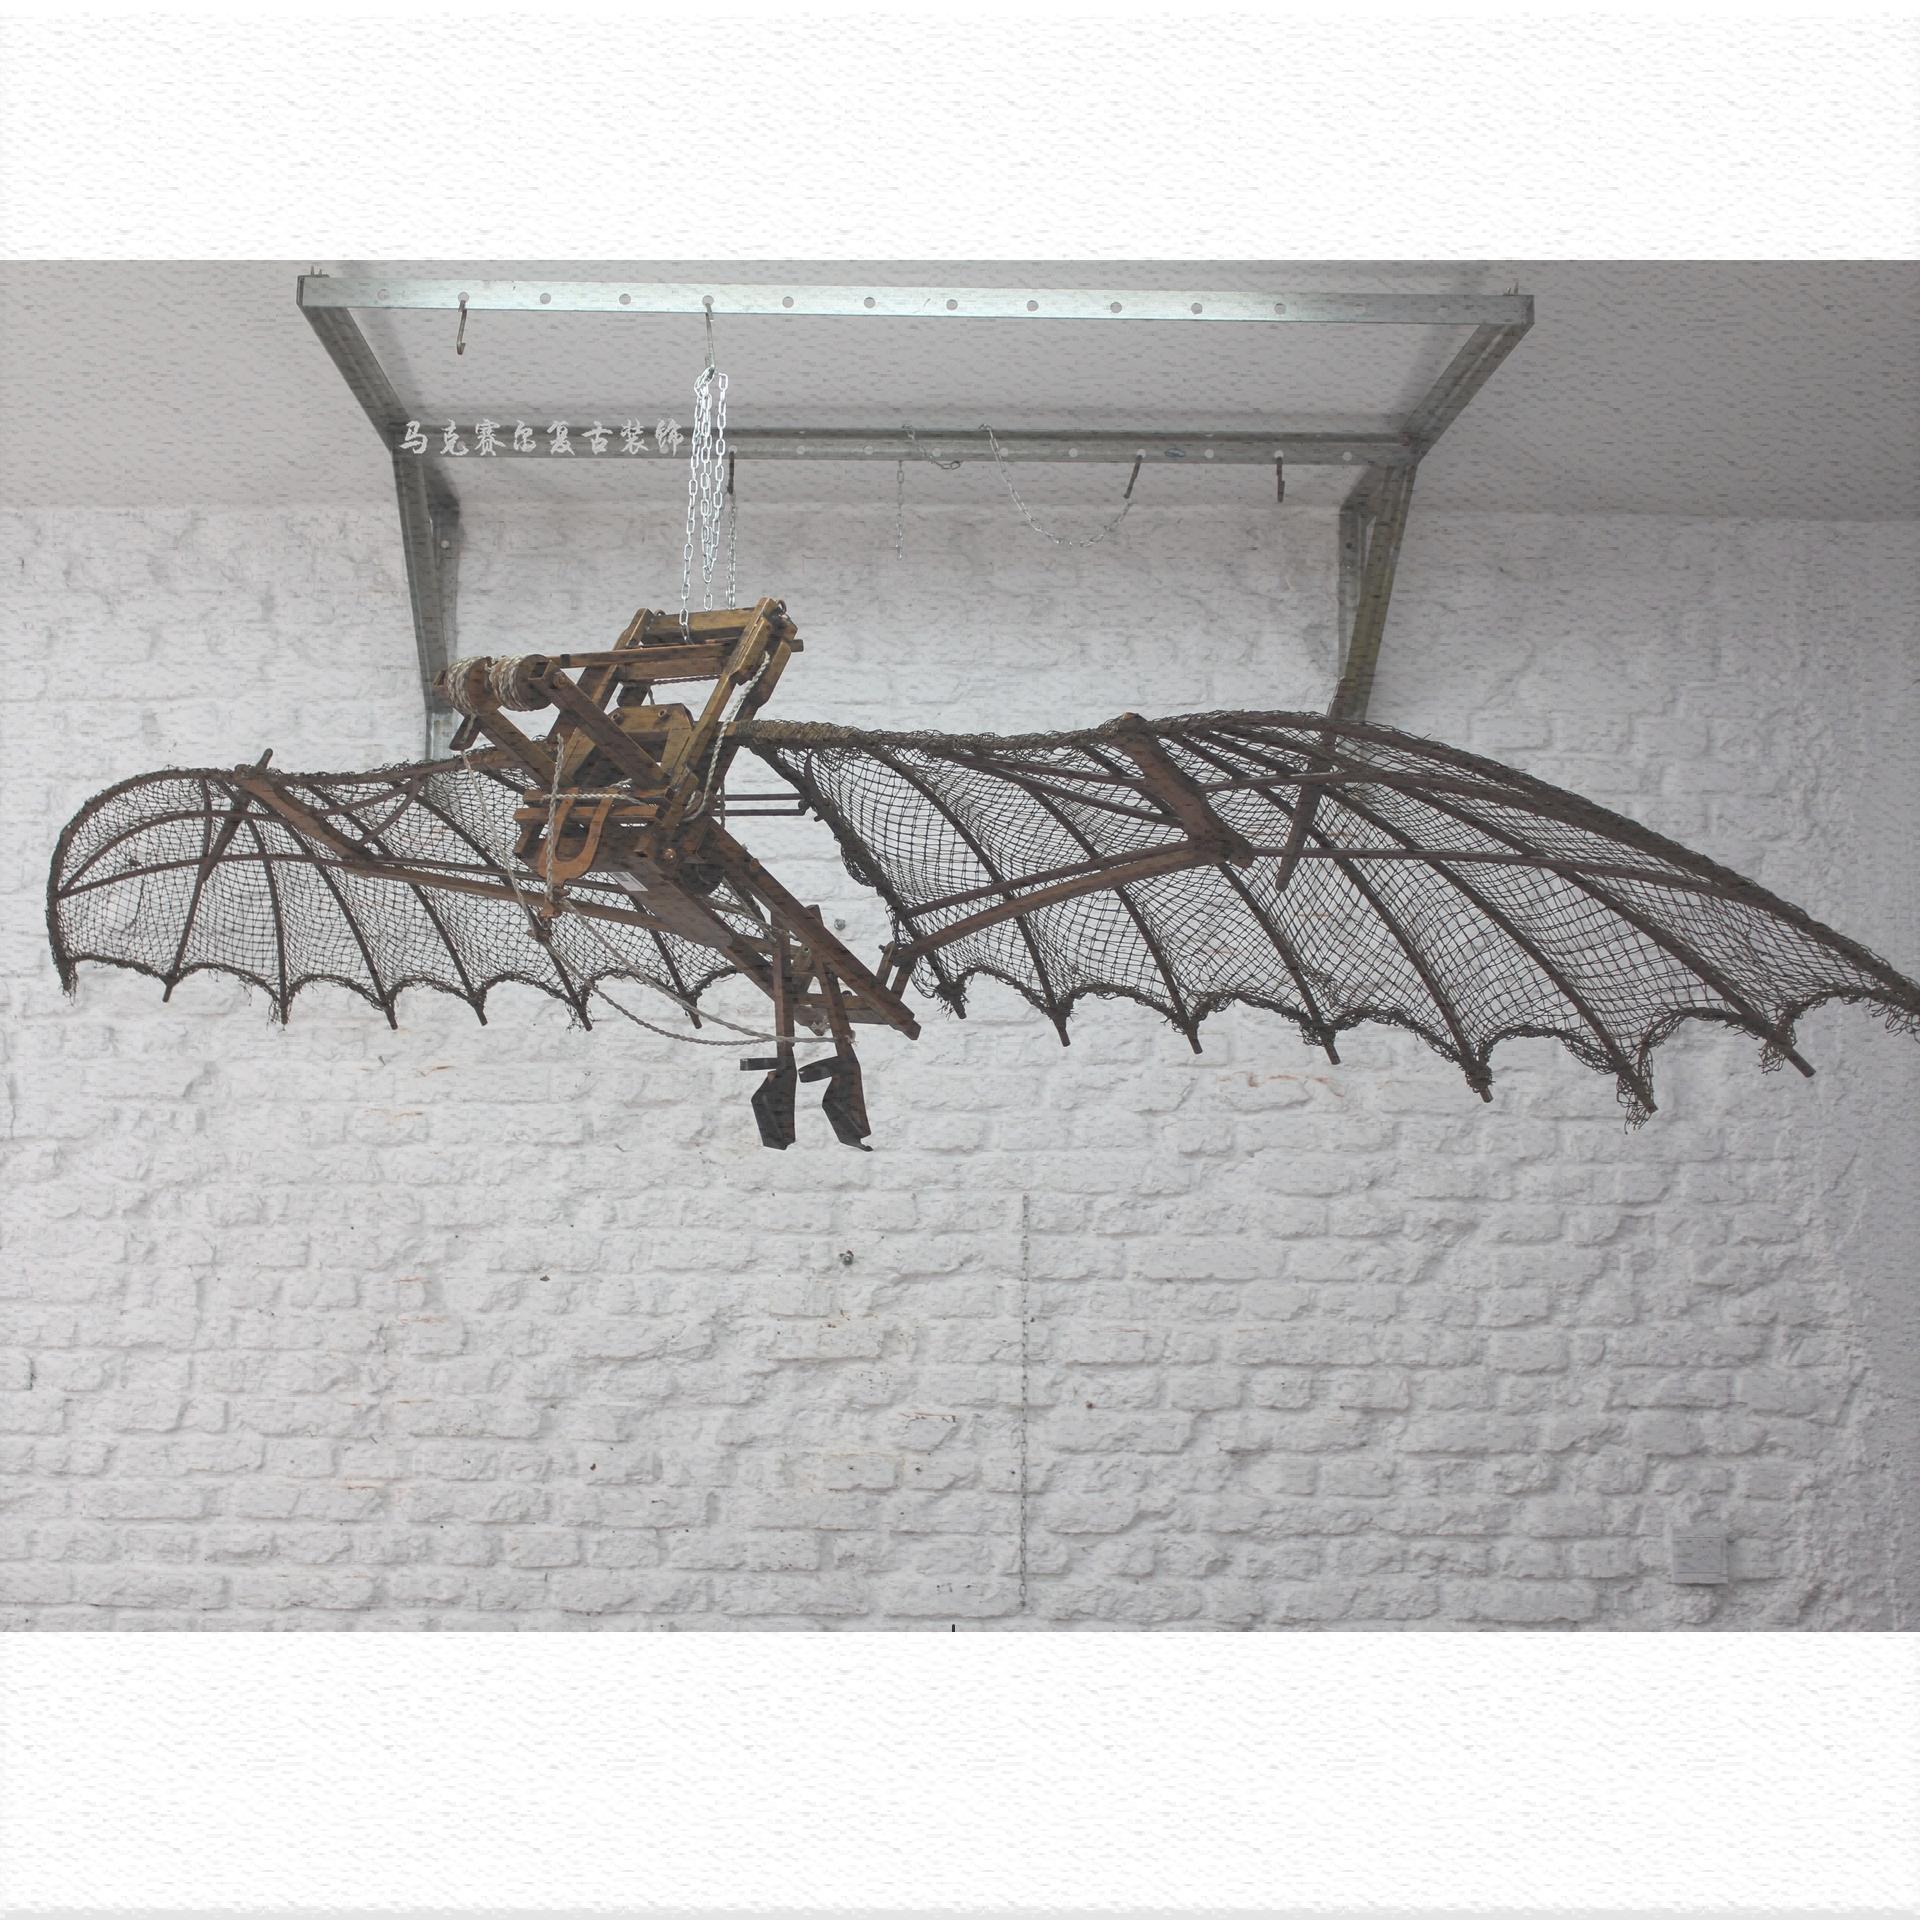 Retro punk iron large indoor wing bat flying wing 3M pendant Decoration bar restaurant aircraft